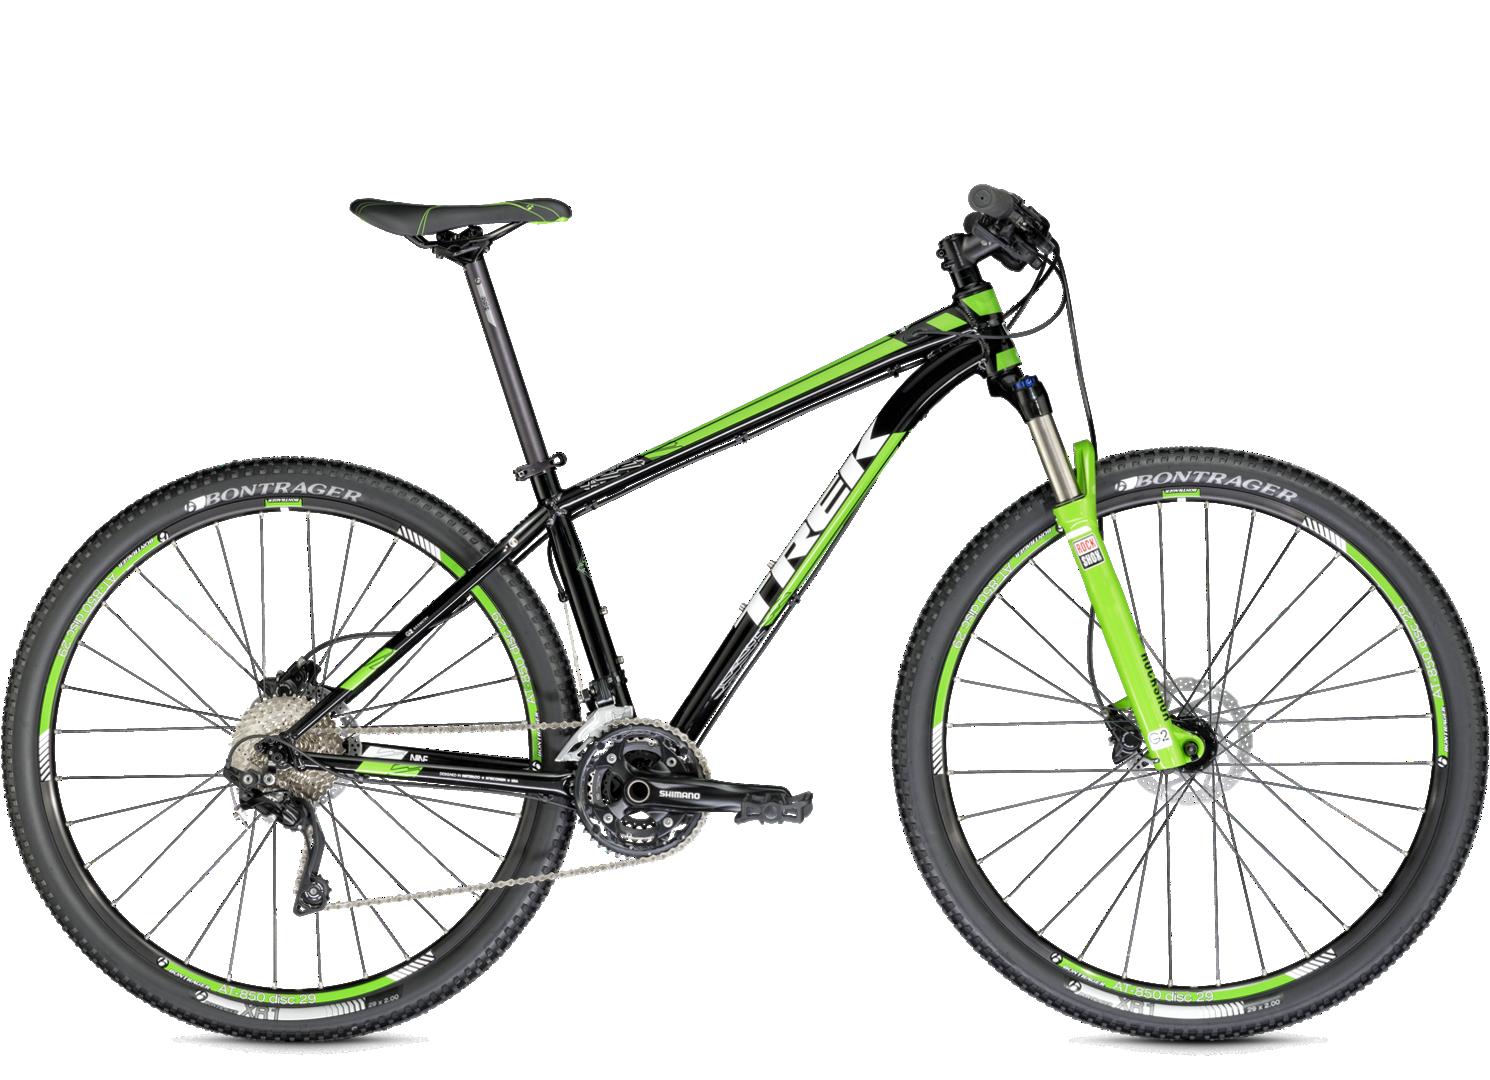 Bicycle Tune Up >> 2014 X-Caliber 9 - Bike Archive - Trek Bicycle